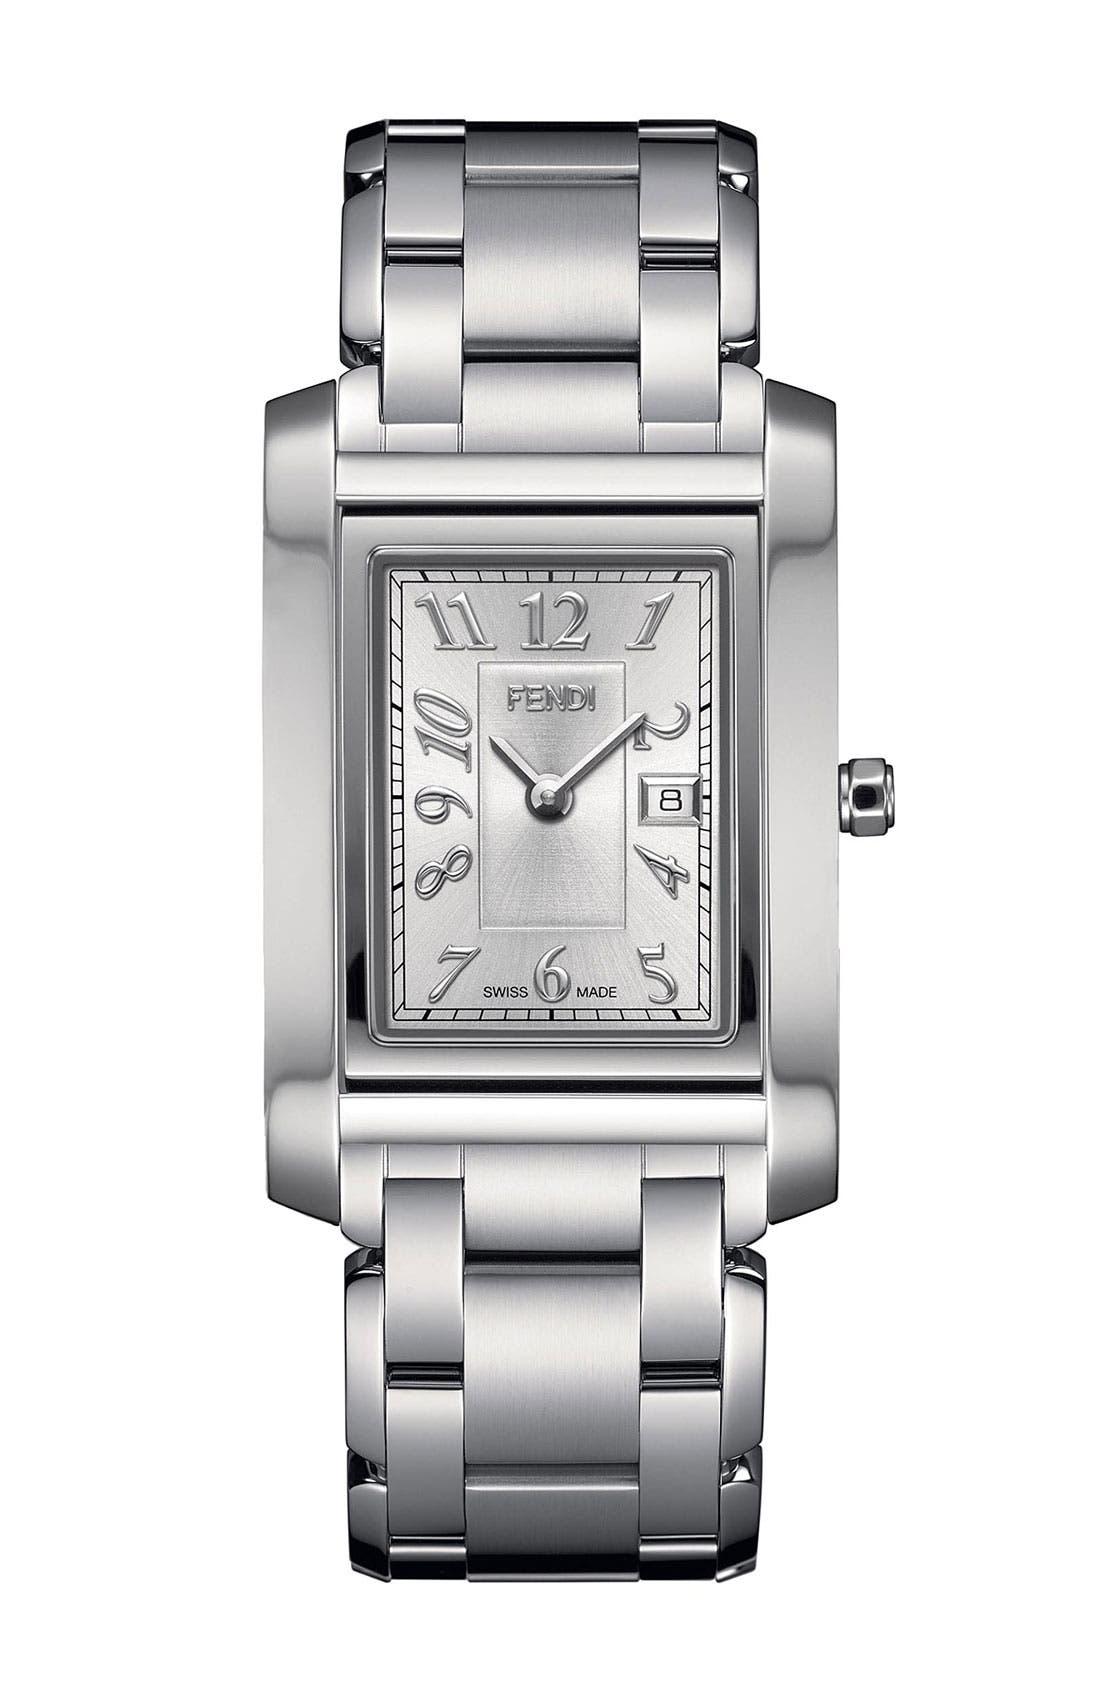 Alternate Image 1 Selected - Fendi 'Loop - Large' Rectangular Bracelet Watch